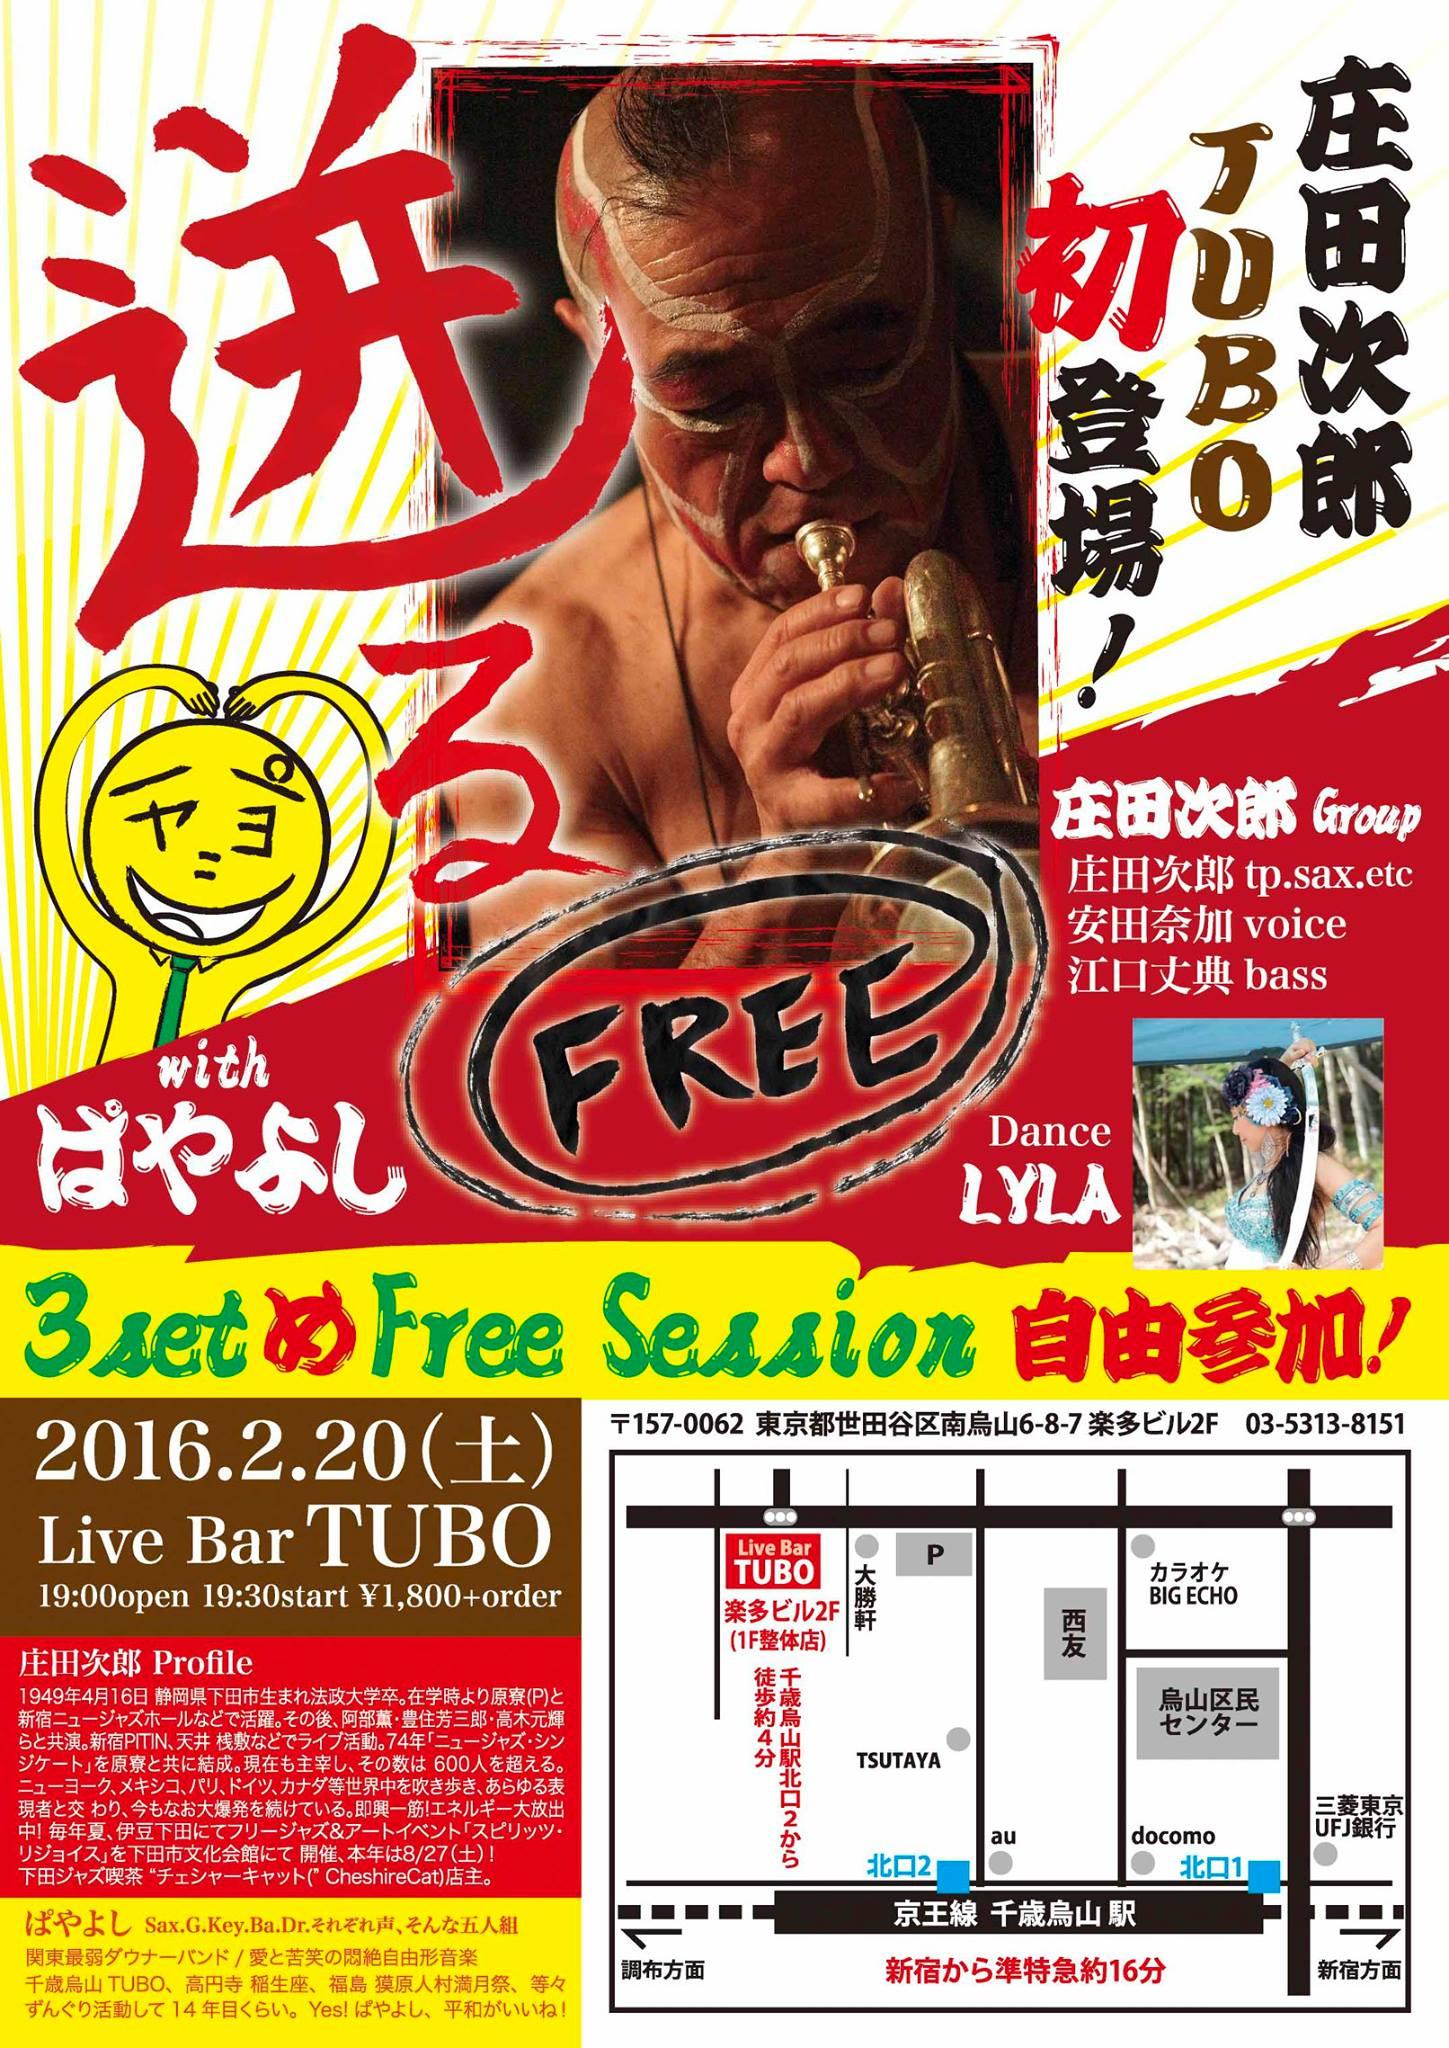 2/20 Live Bar TUBO(つぼ)